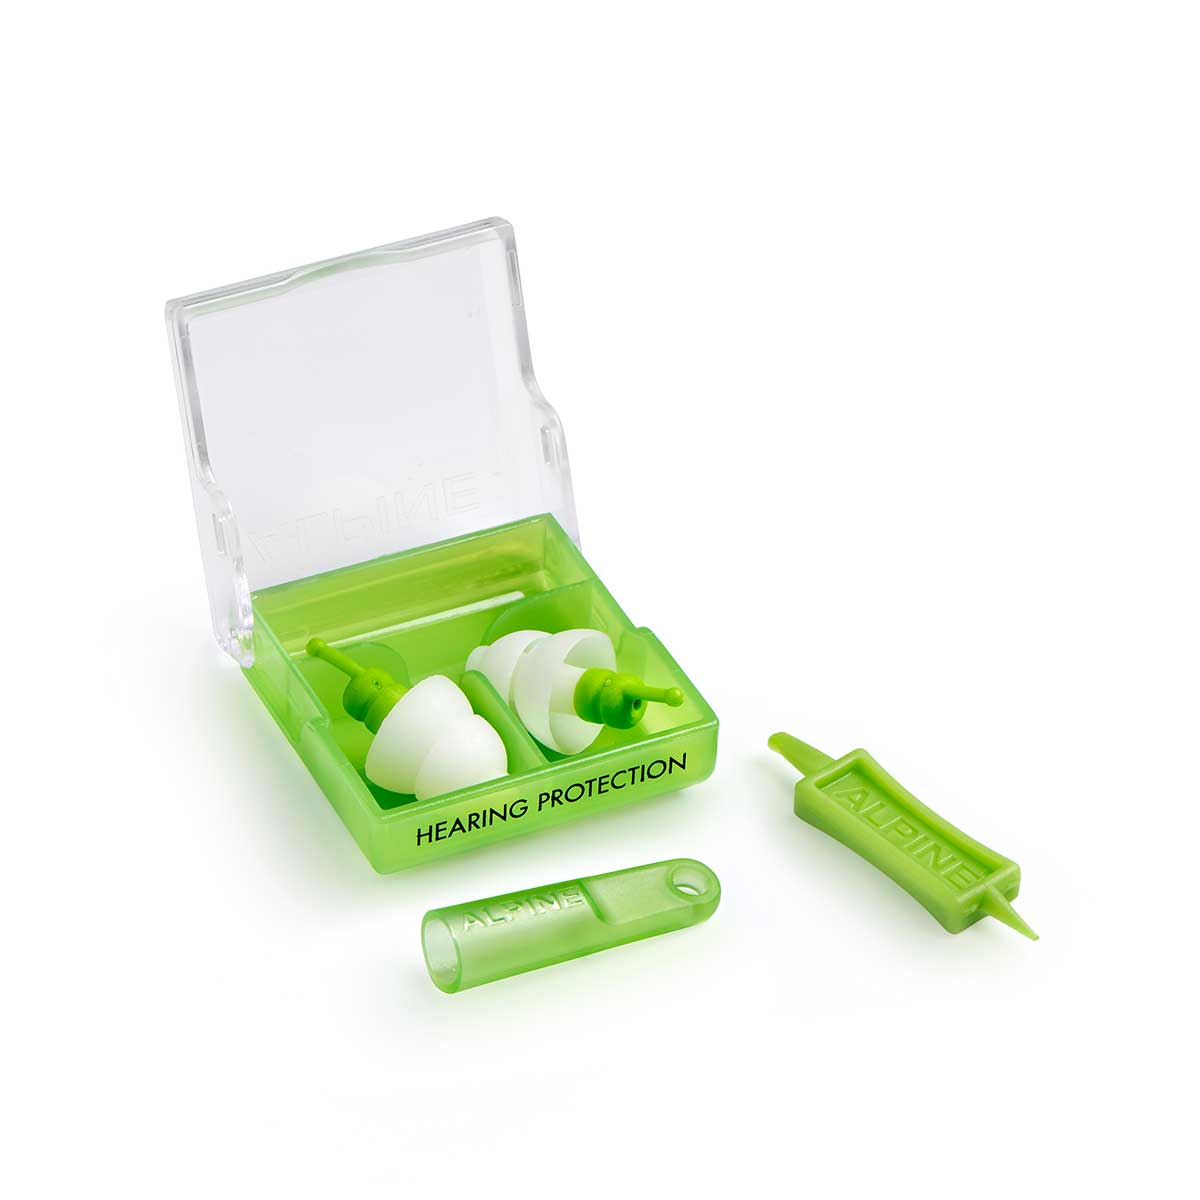 Sleepsoft-minigrip-content-earplugs-alpine-hearing-protection